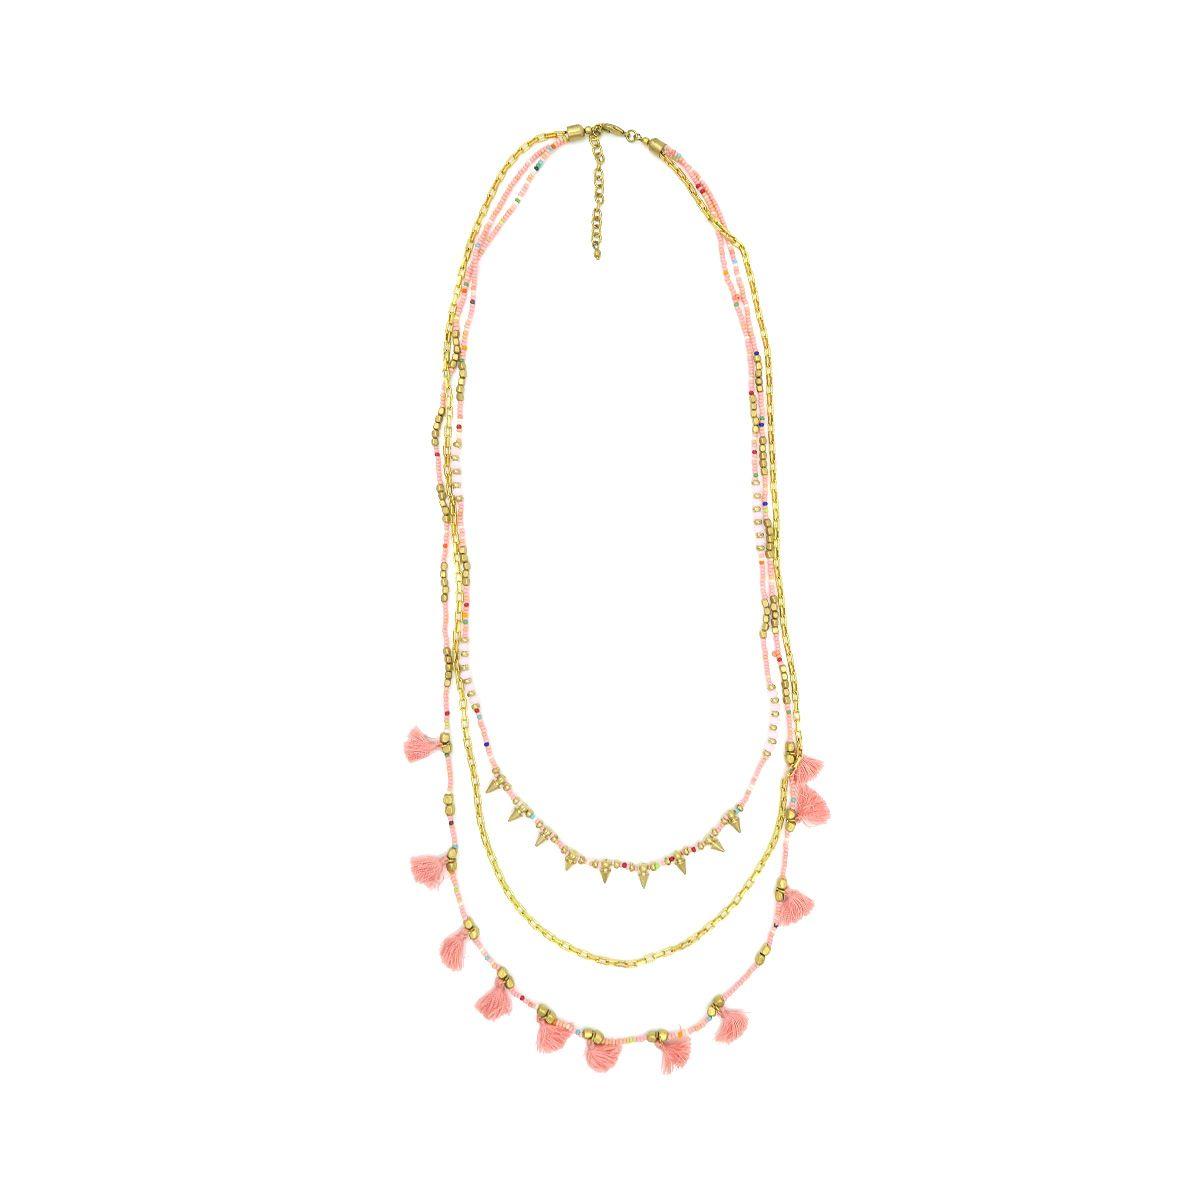 Balinese Jewelry Designs Magica